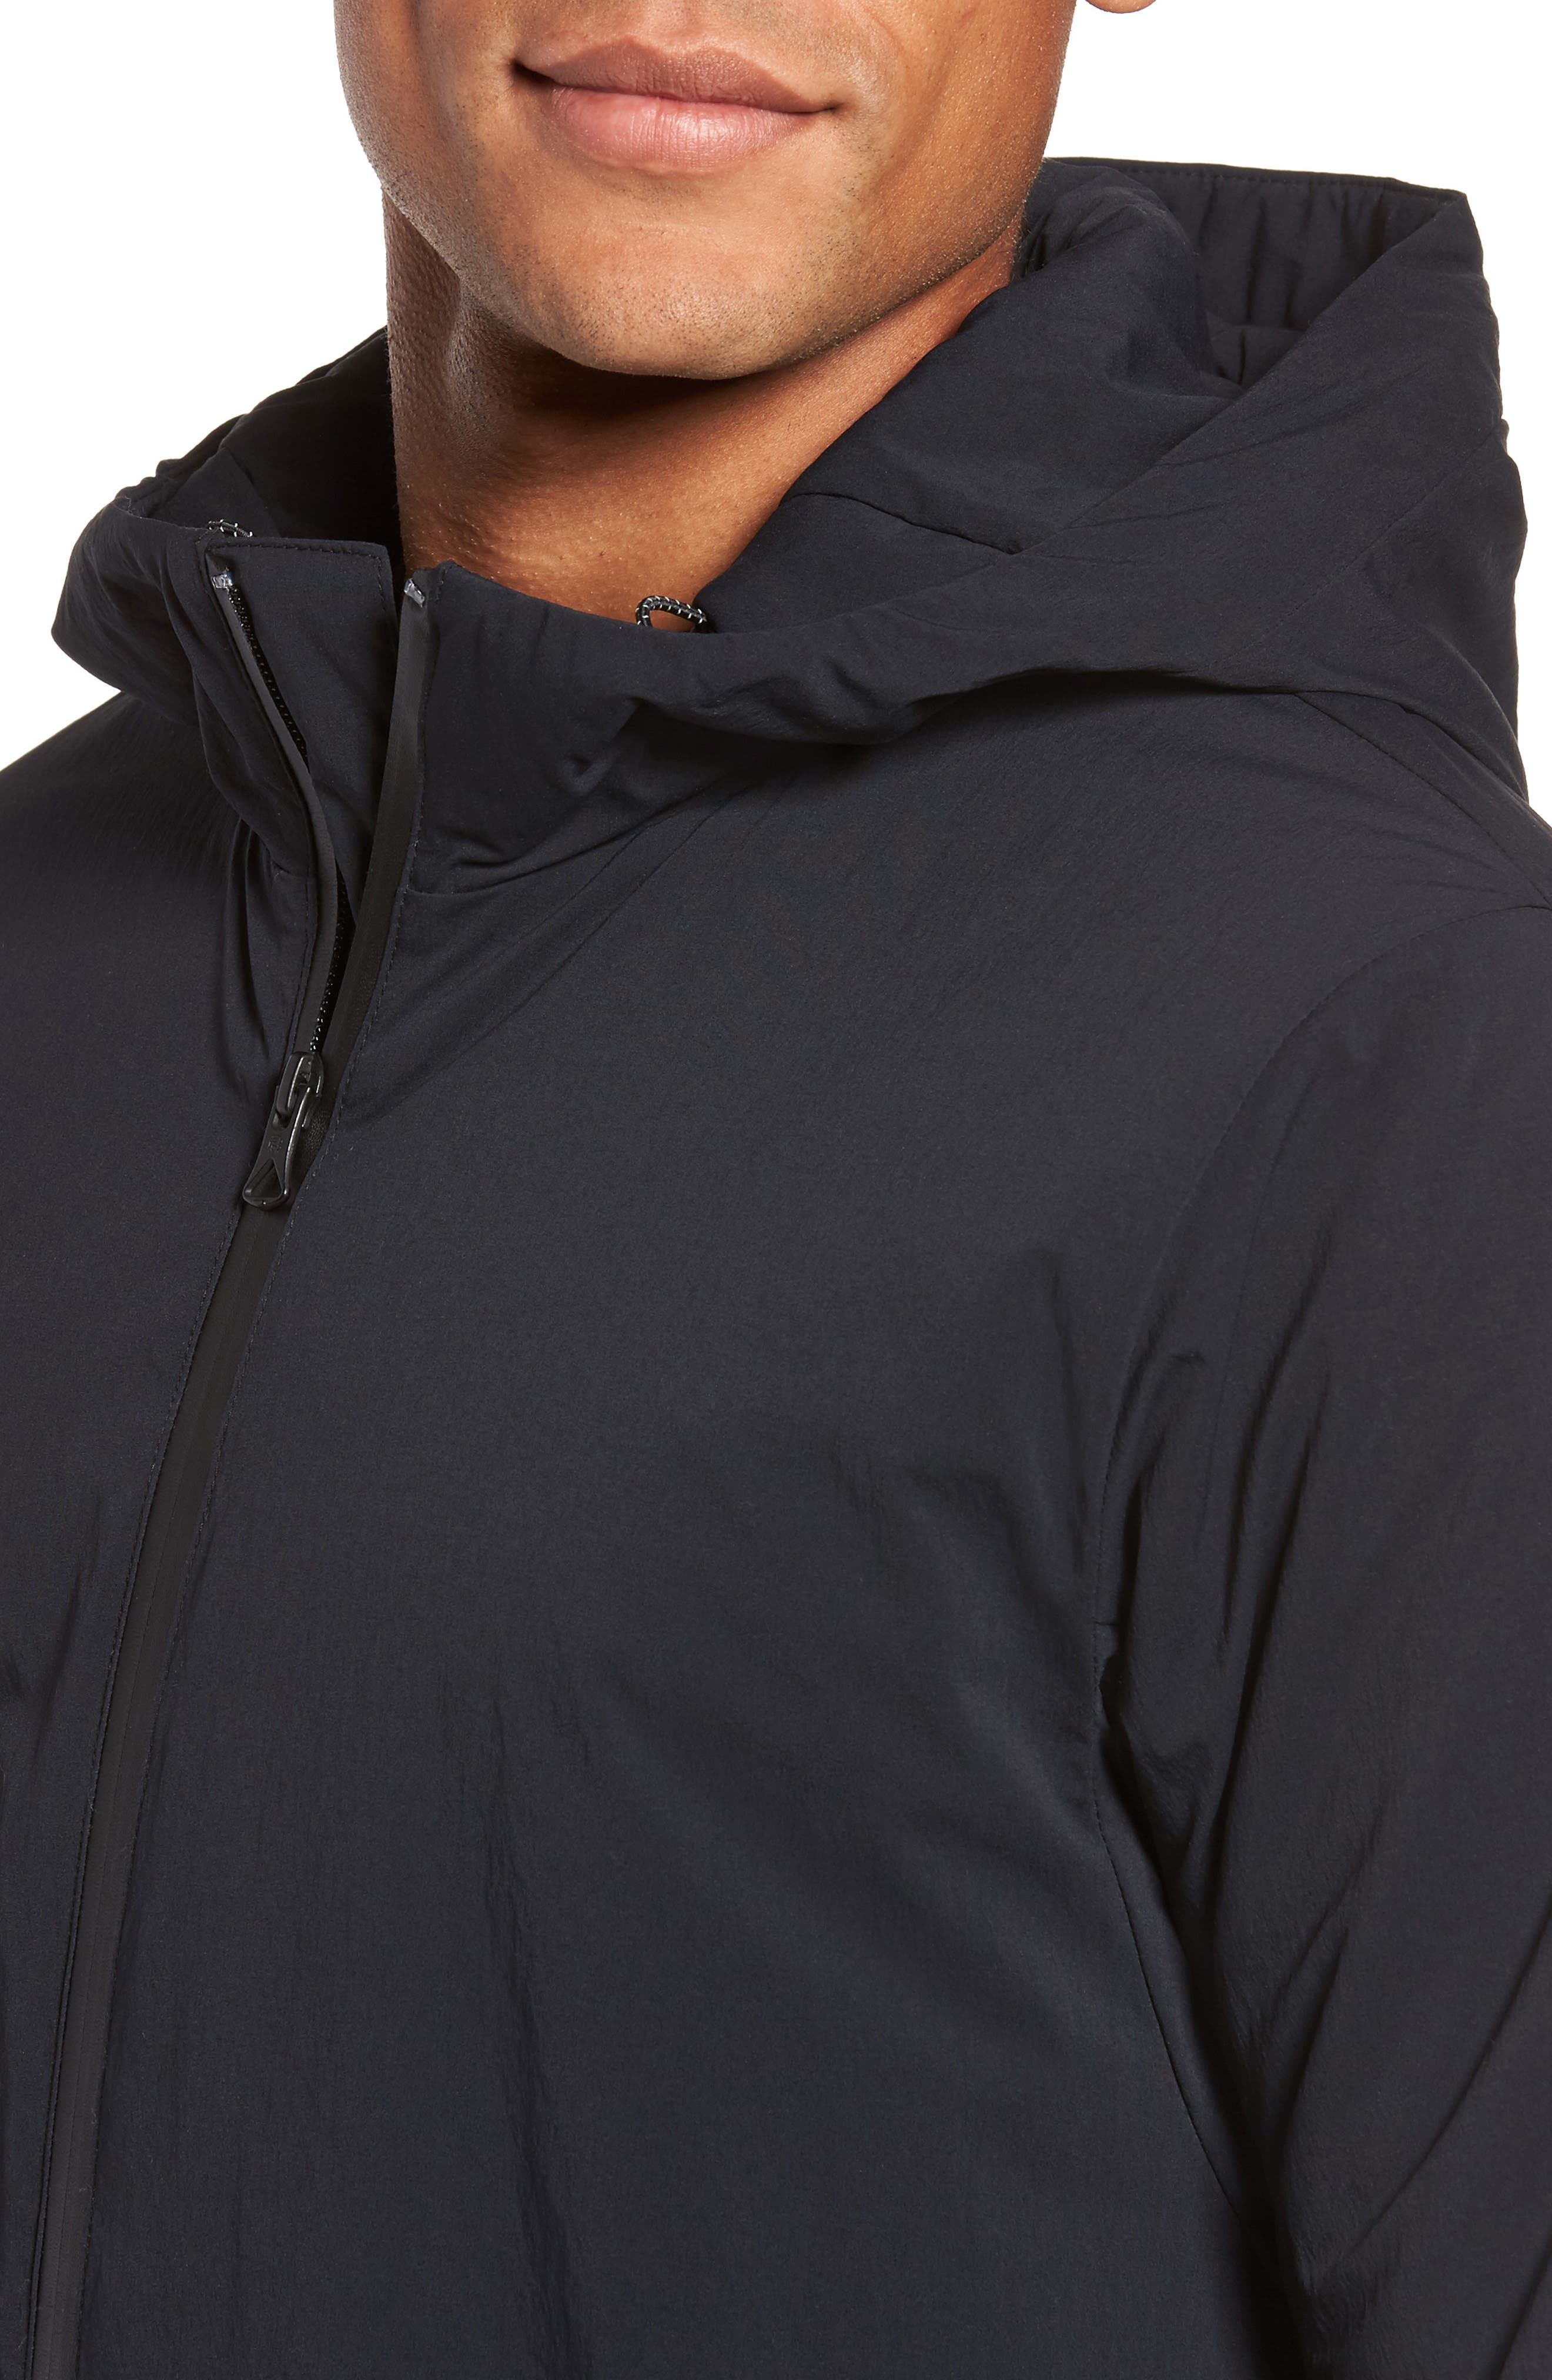 Insulated Trim Sideline Jacket,                             Alternate thumbnail 4, color,